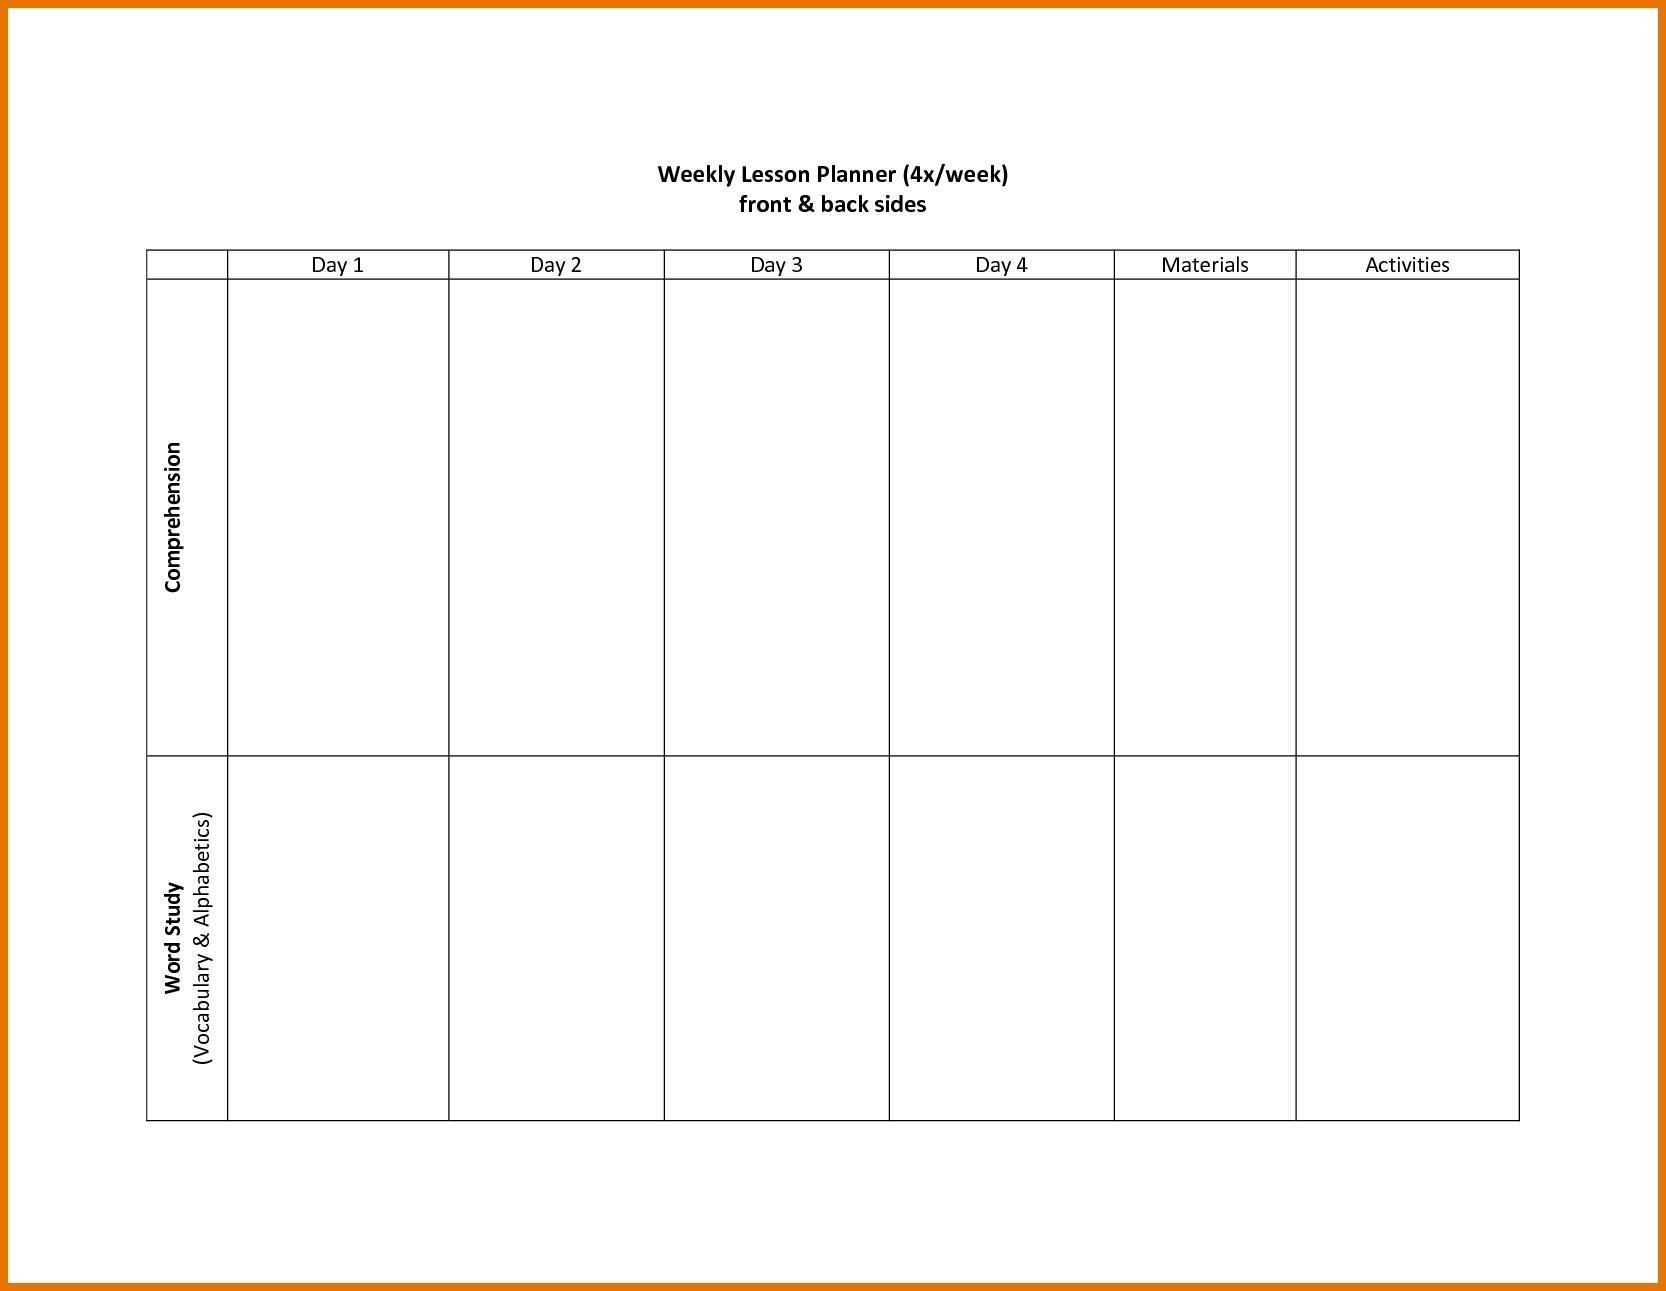 Two Weeks Calendar Template Week Impression So Printable For Two inside Two Week Calendar Template Free